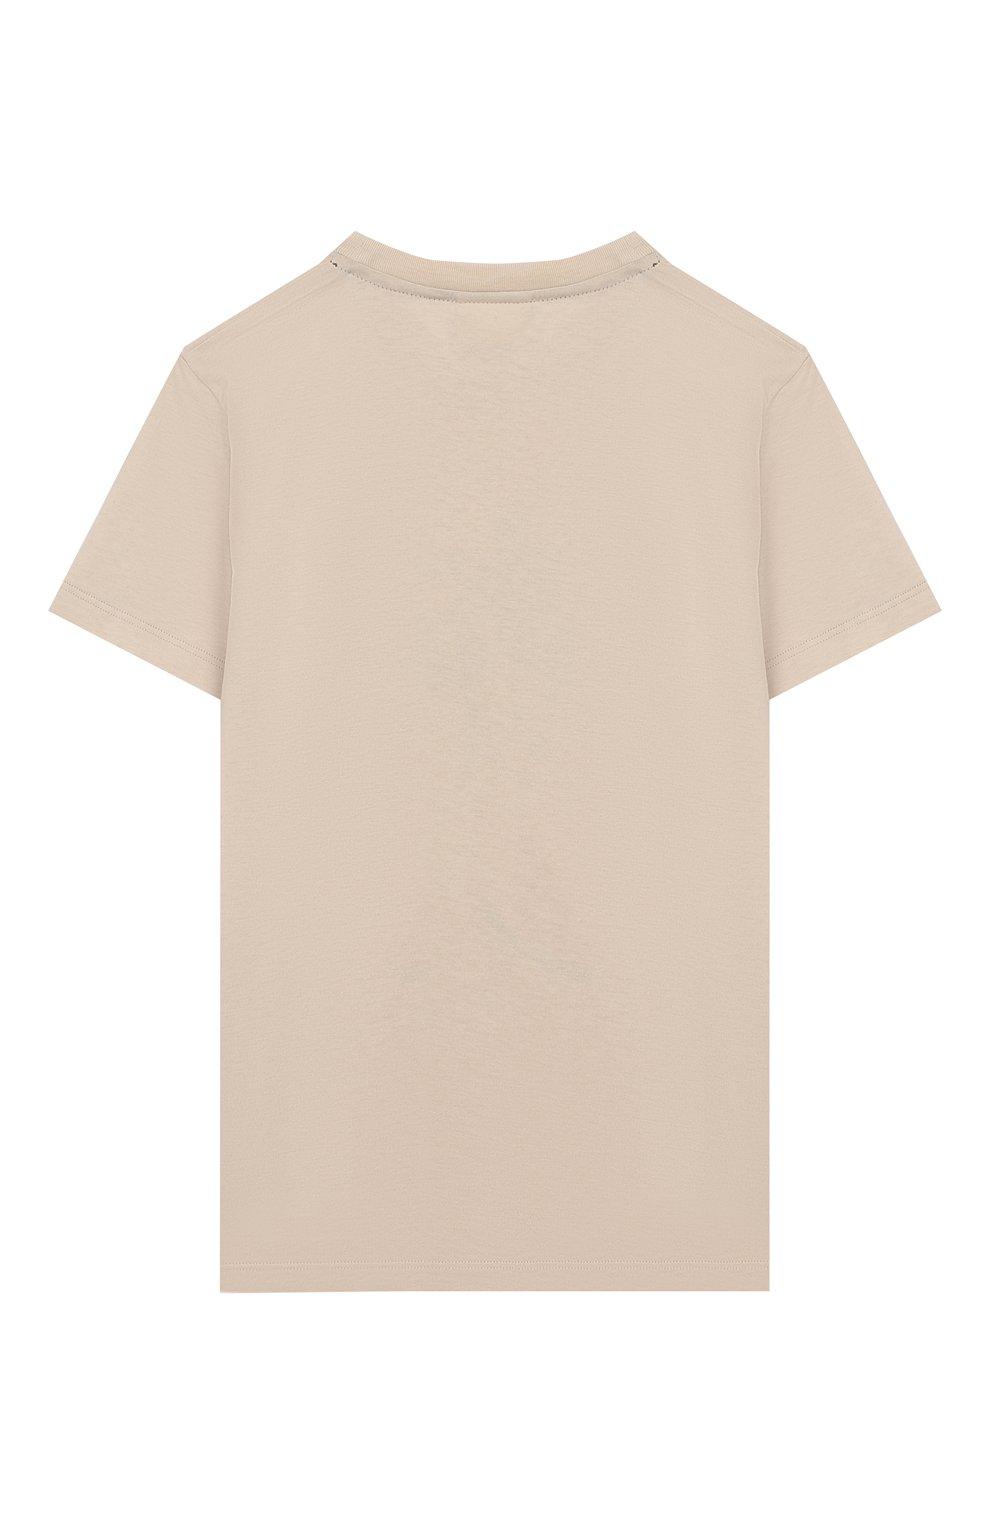 Детская хлопковая футболка FENDI бежевого цвета, арт. JMI314/7AJ/8A-12+ | Фото 2